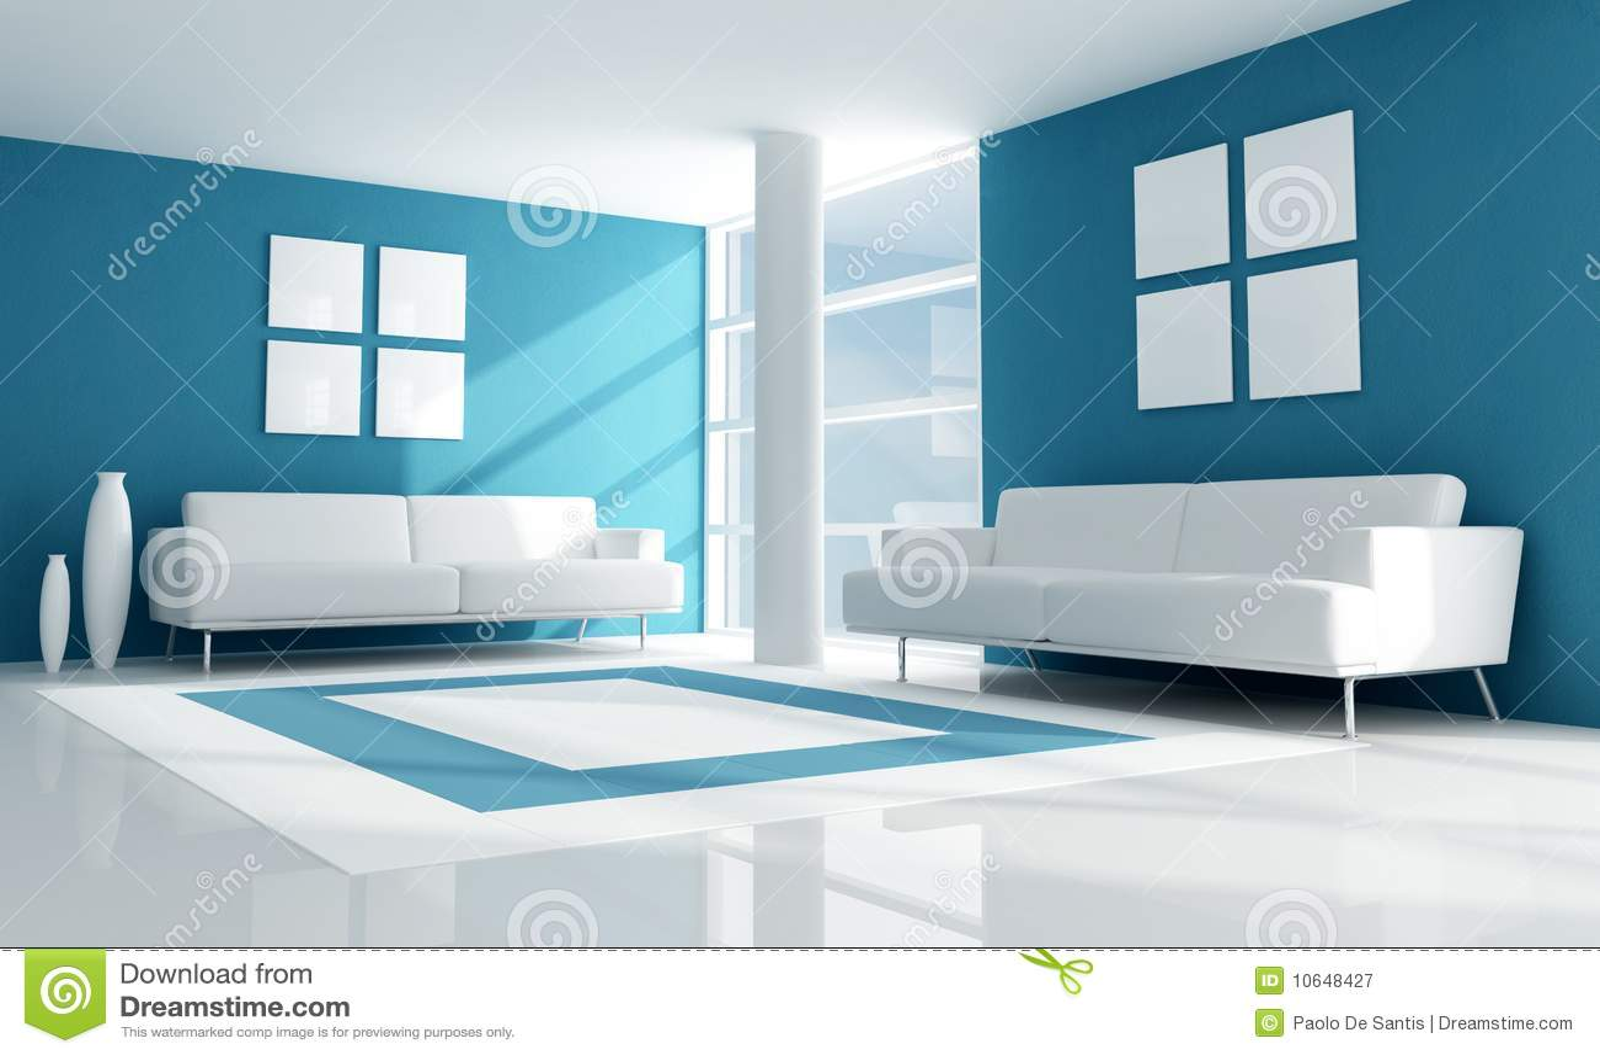 Dark Purple Bedroom Blue And White Modern Living Room Royalty Free Stock